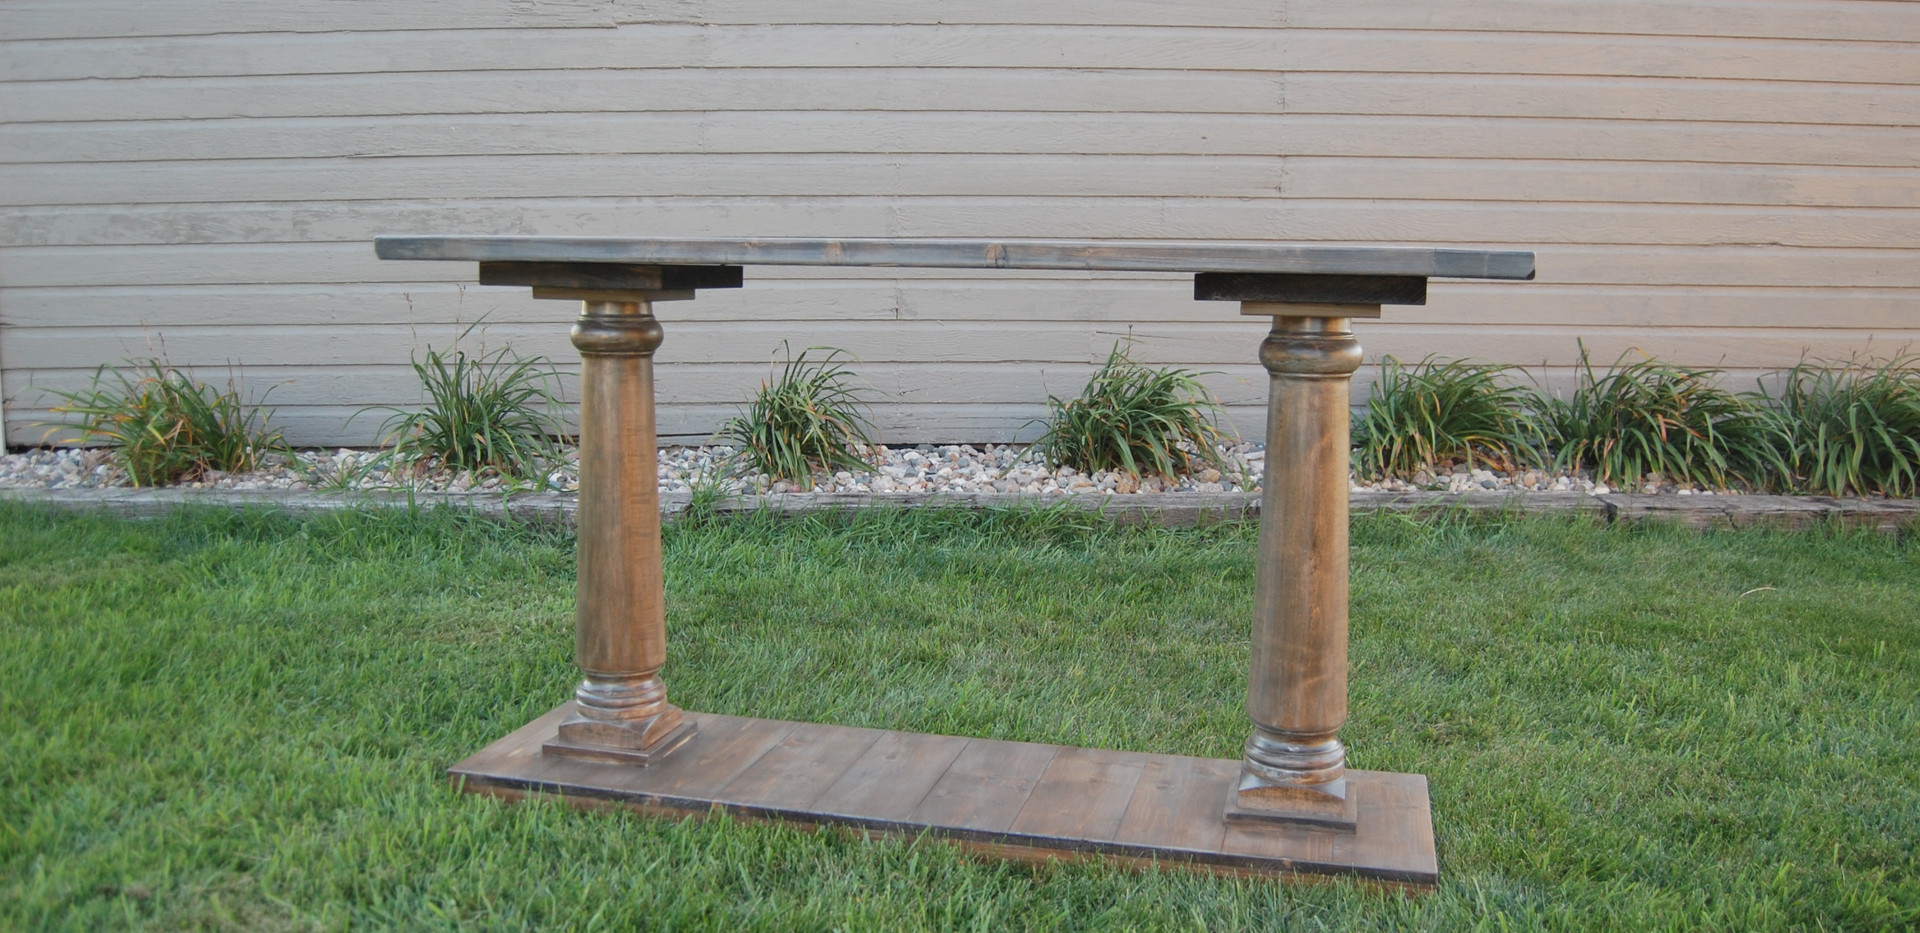 Baulstrade Table